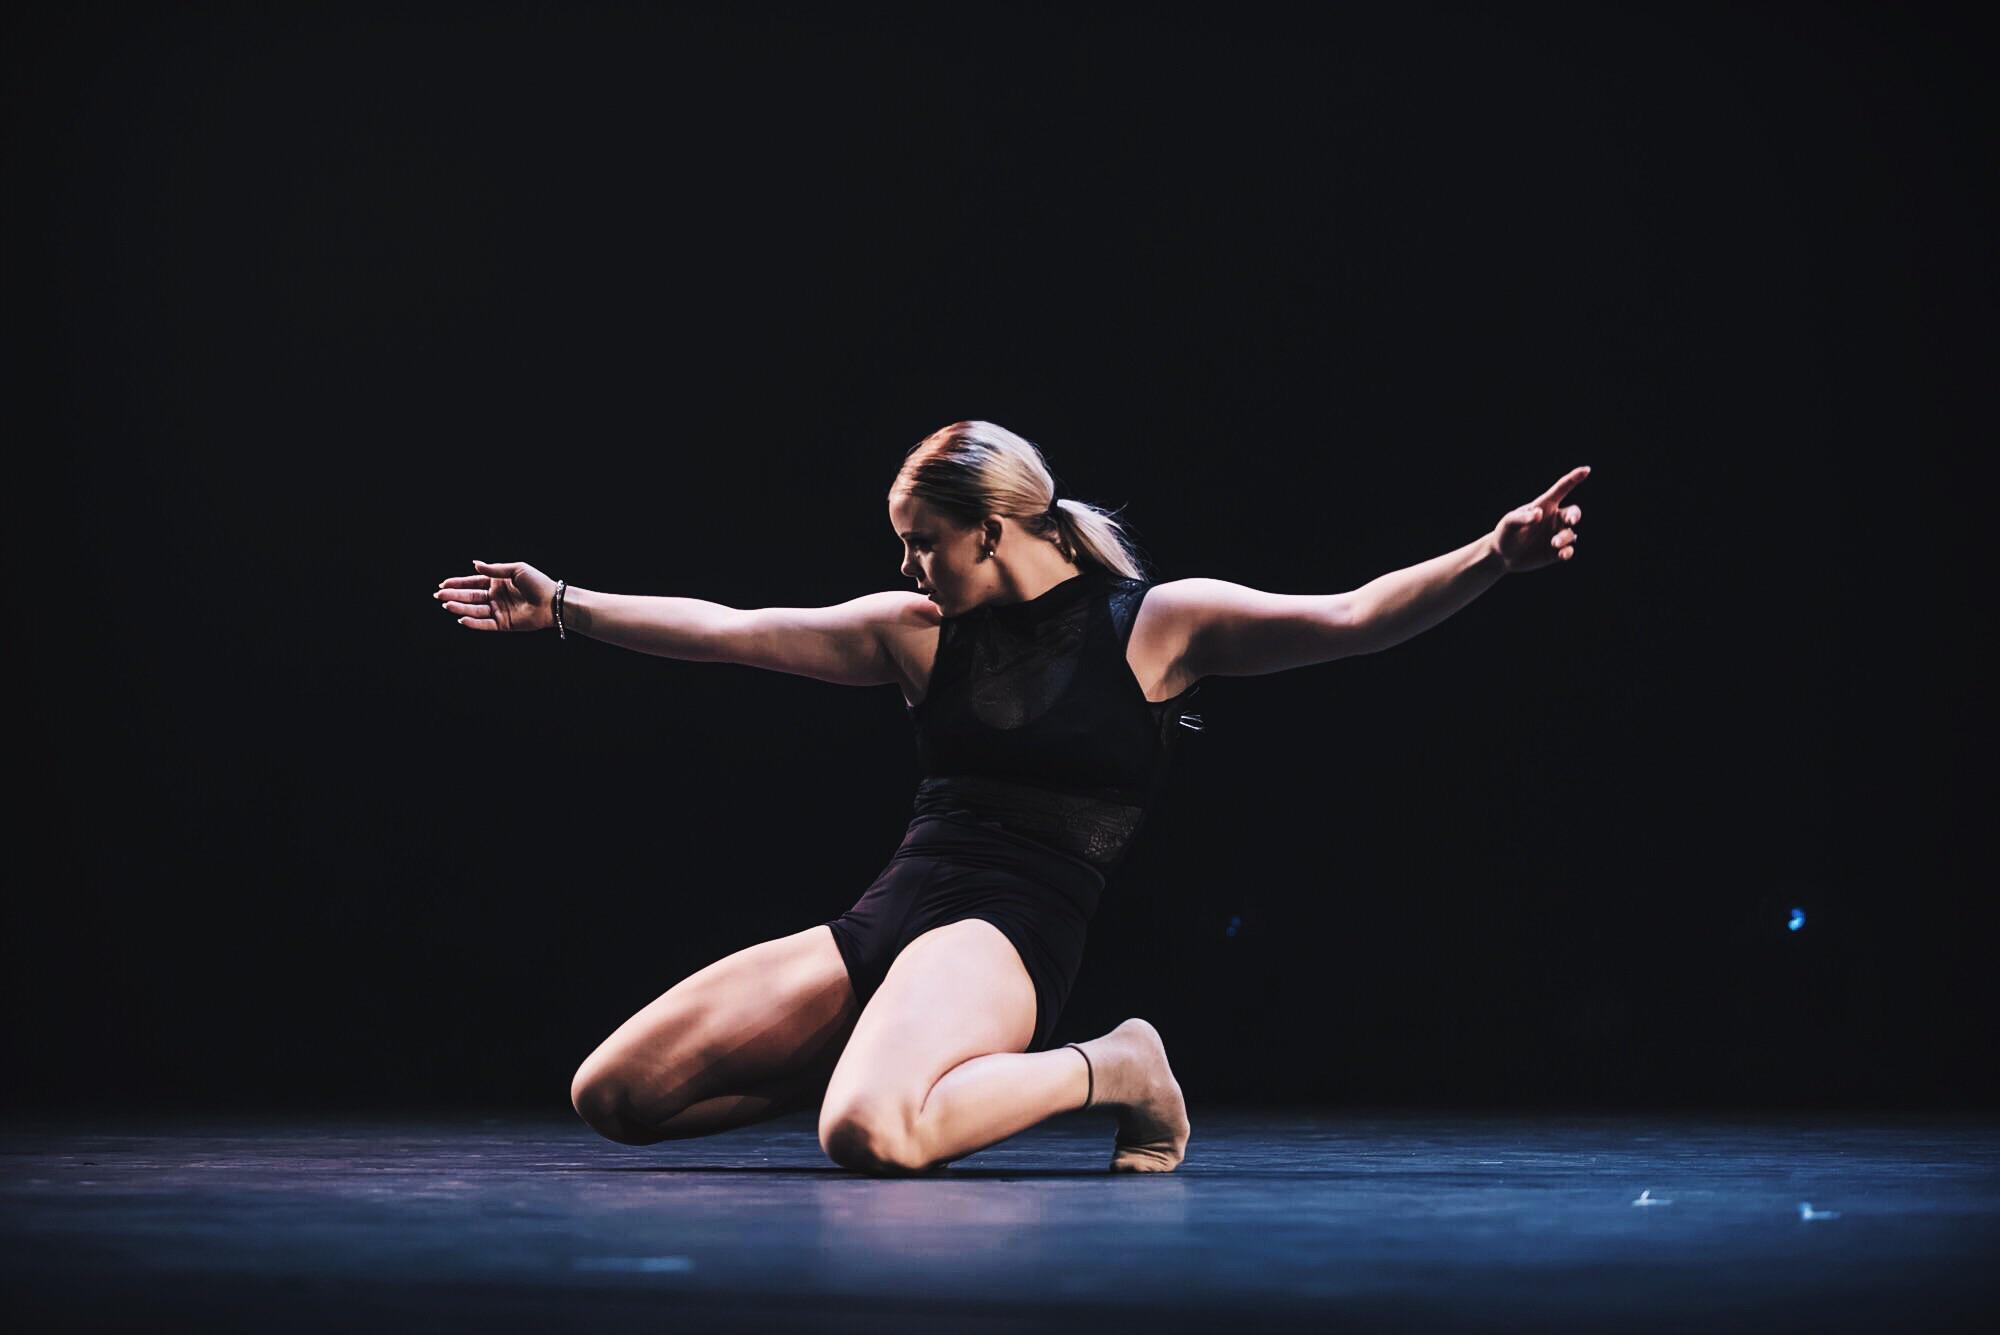 Sarah Brinson at The Vancouver Playhouse (J Chan Photography)